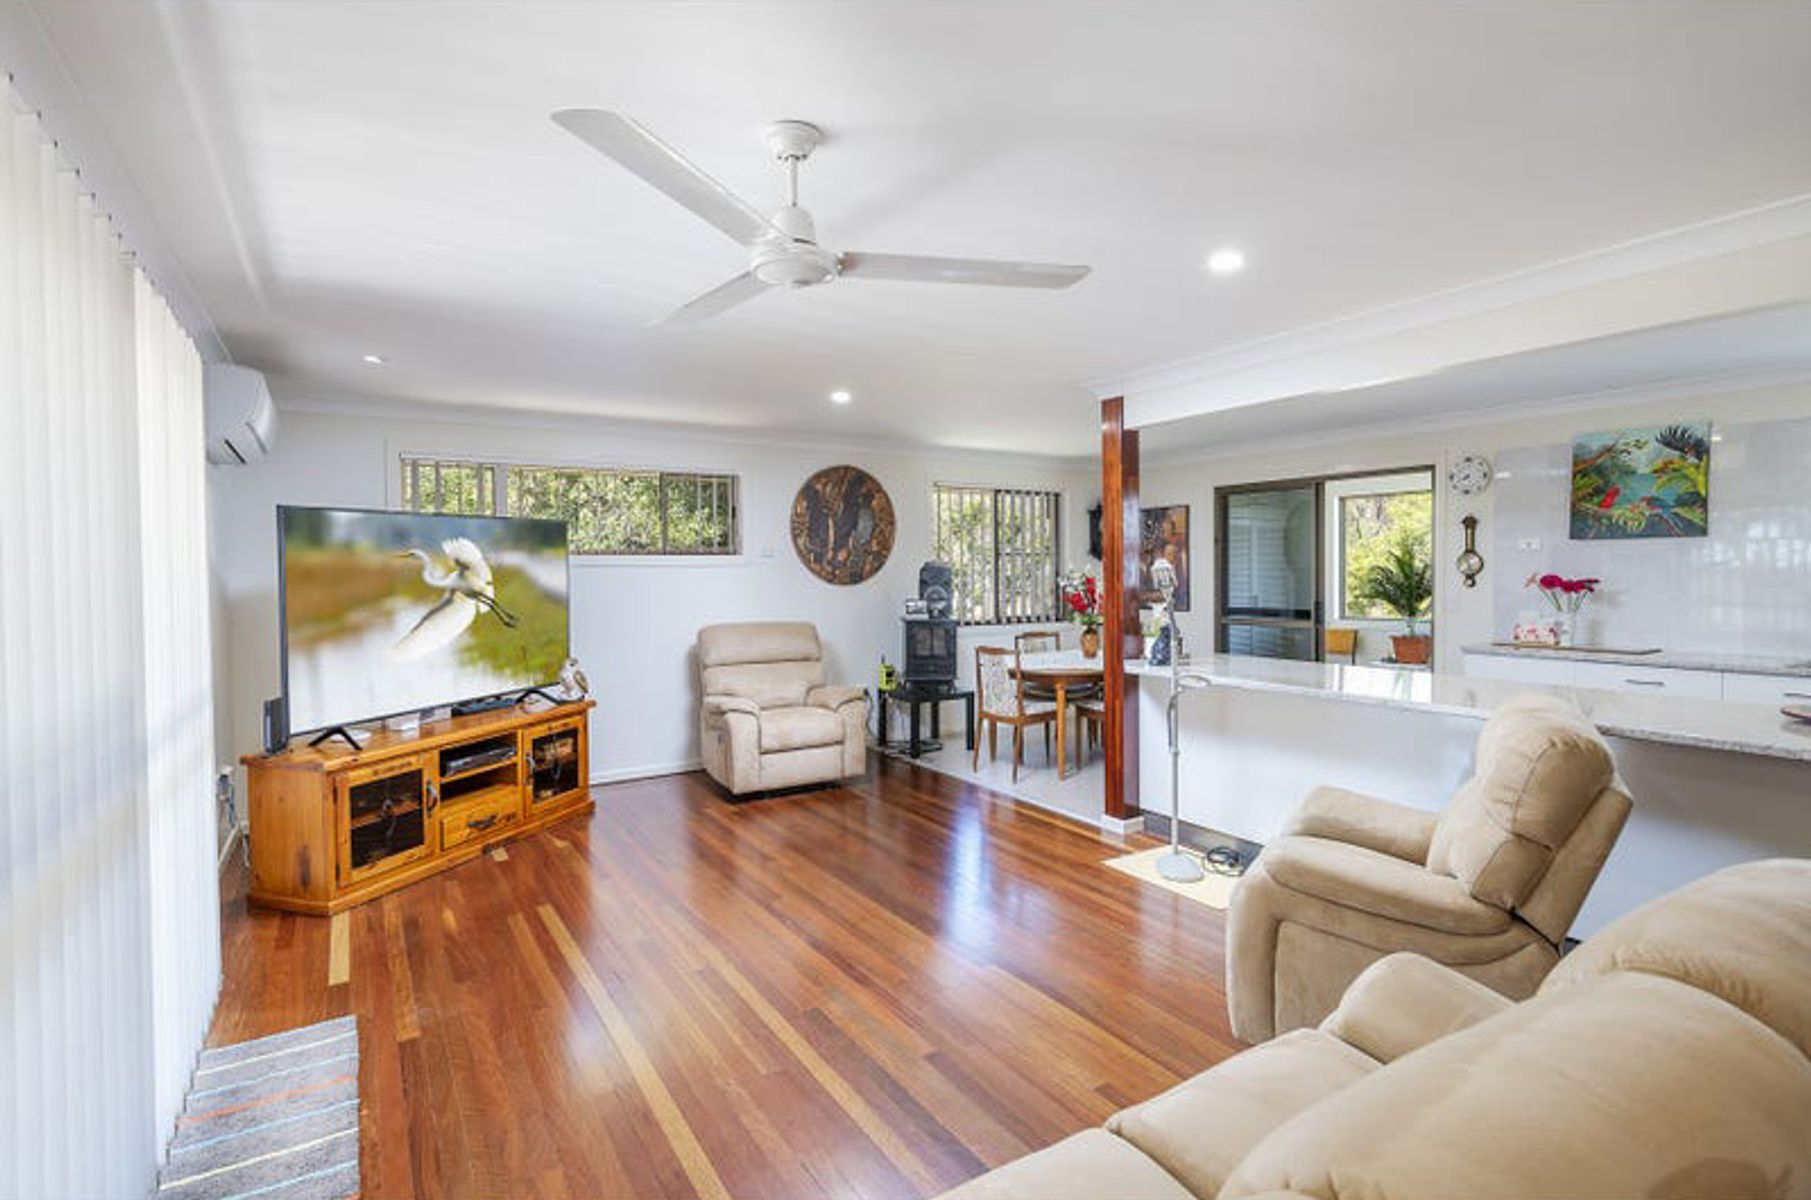 10 Low Street, Kensington, QLD 4670